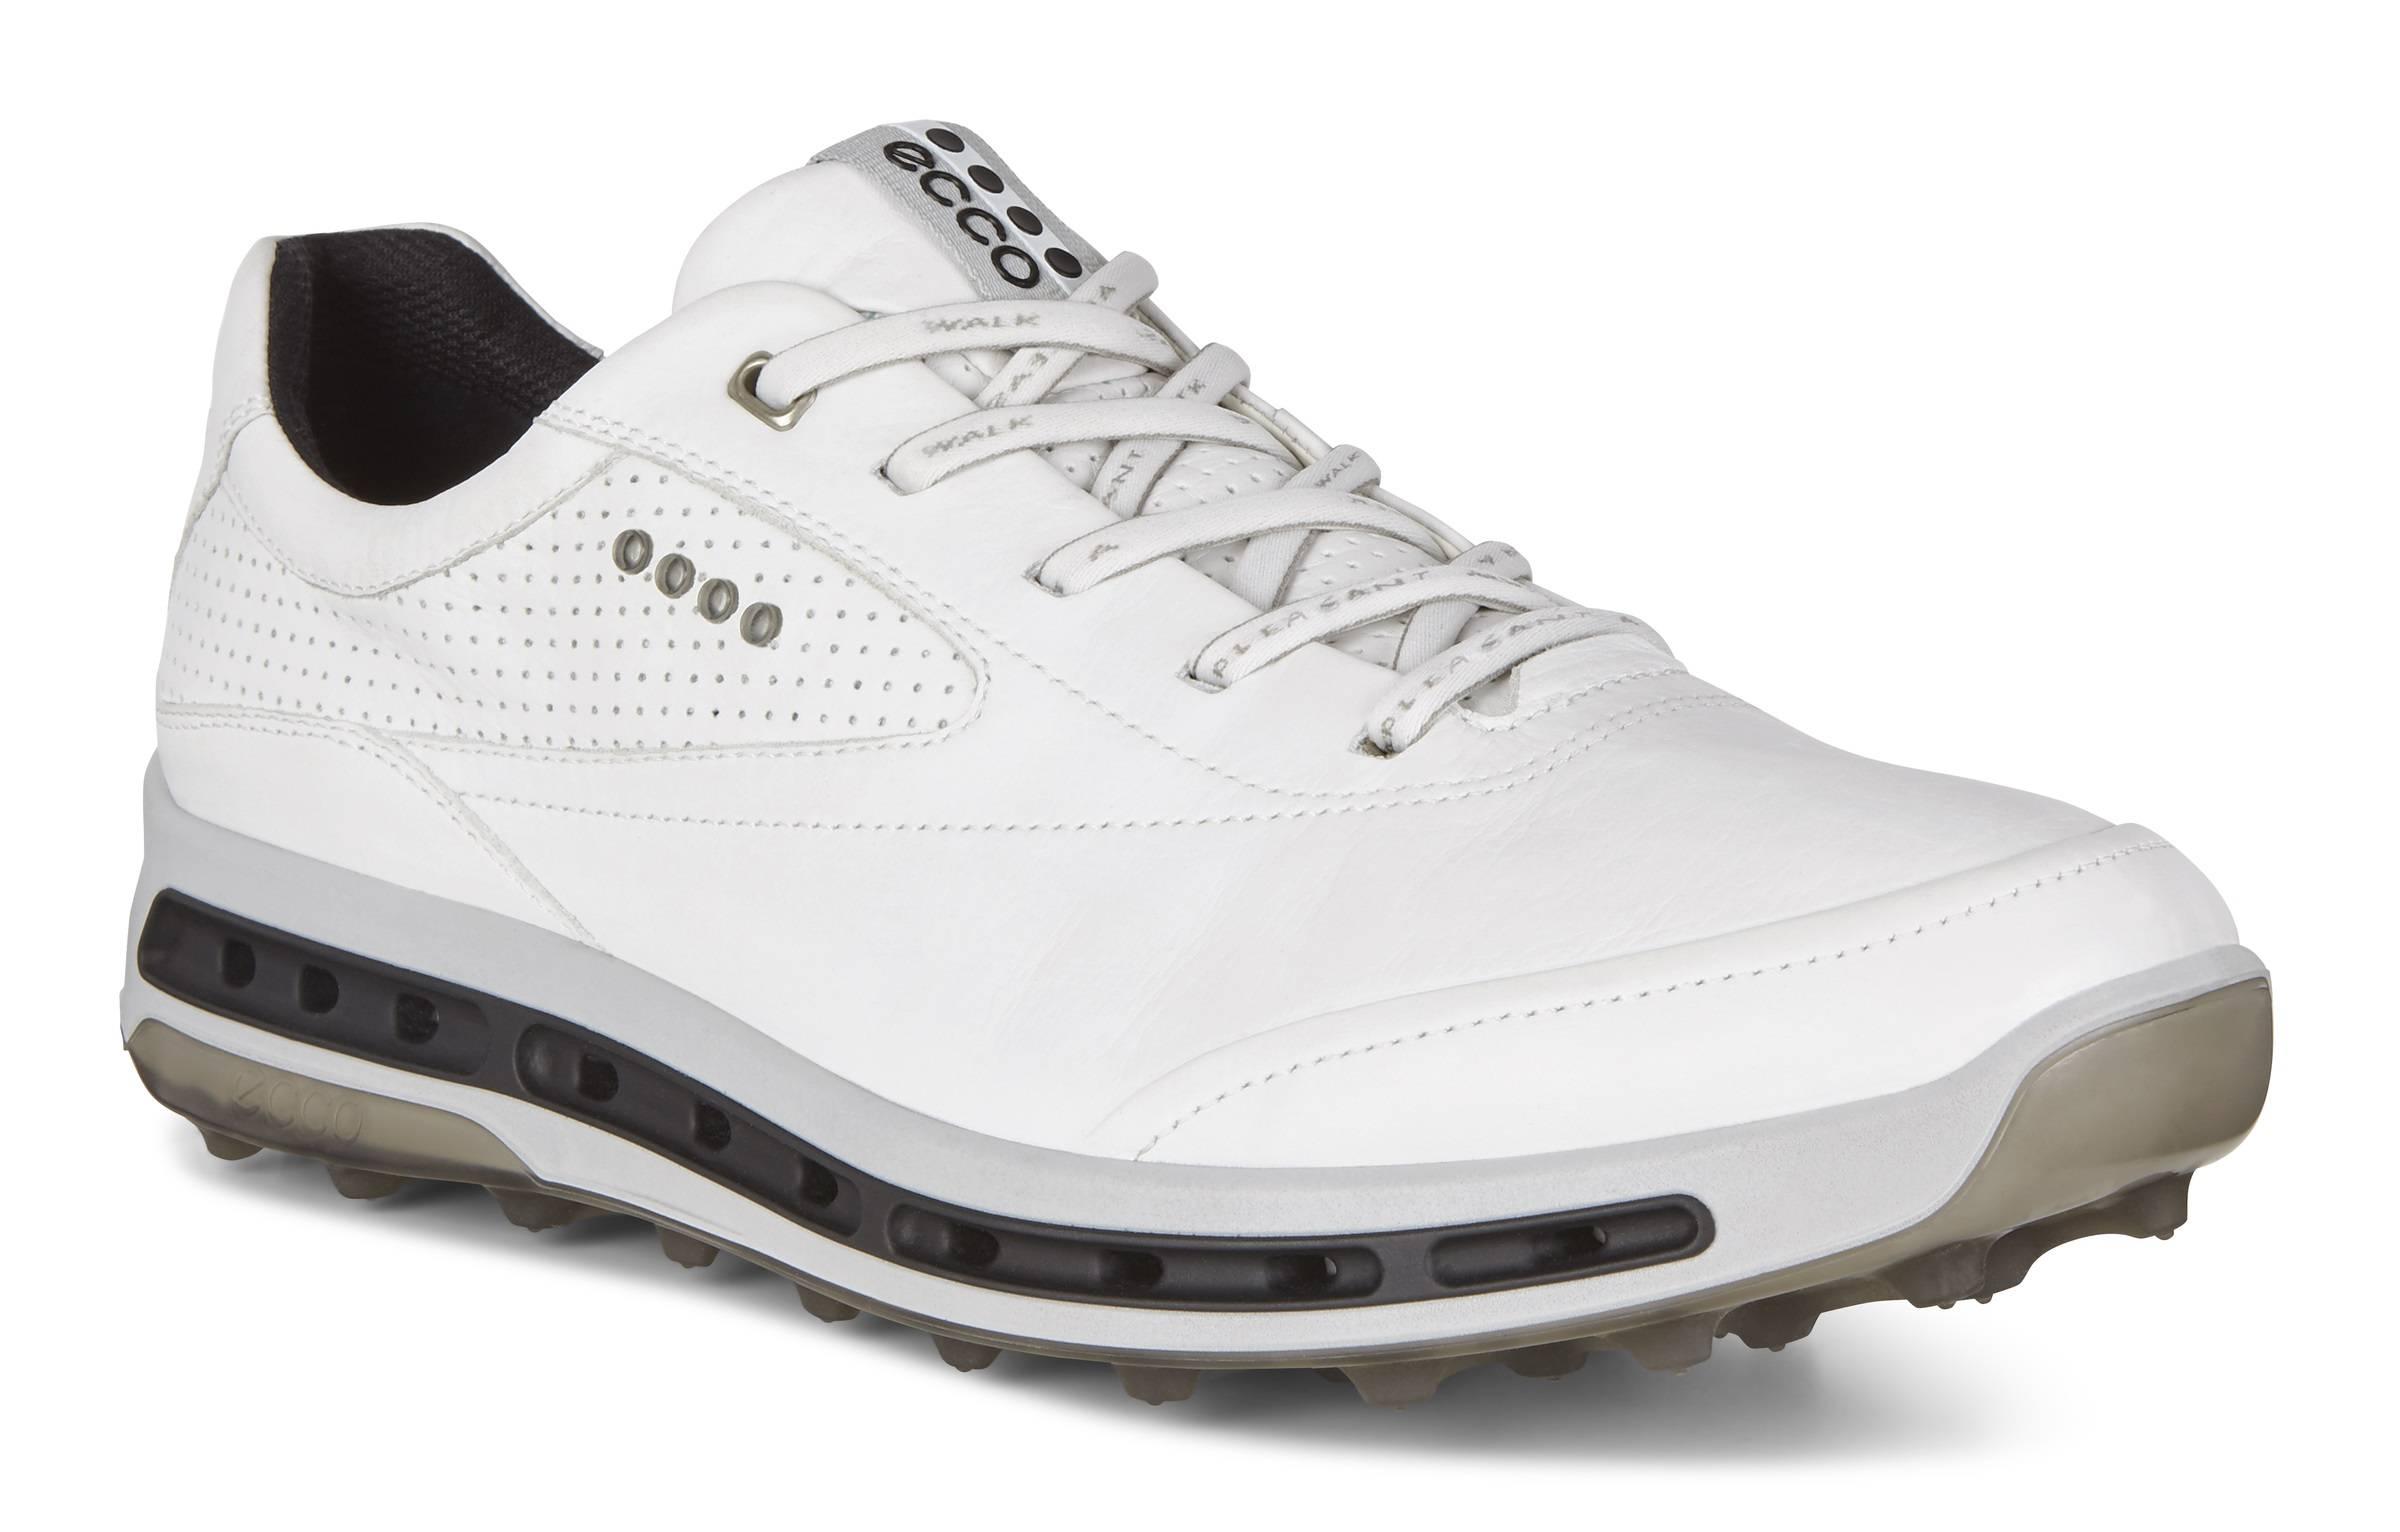 Ecco_Golf_Cool_Pro_